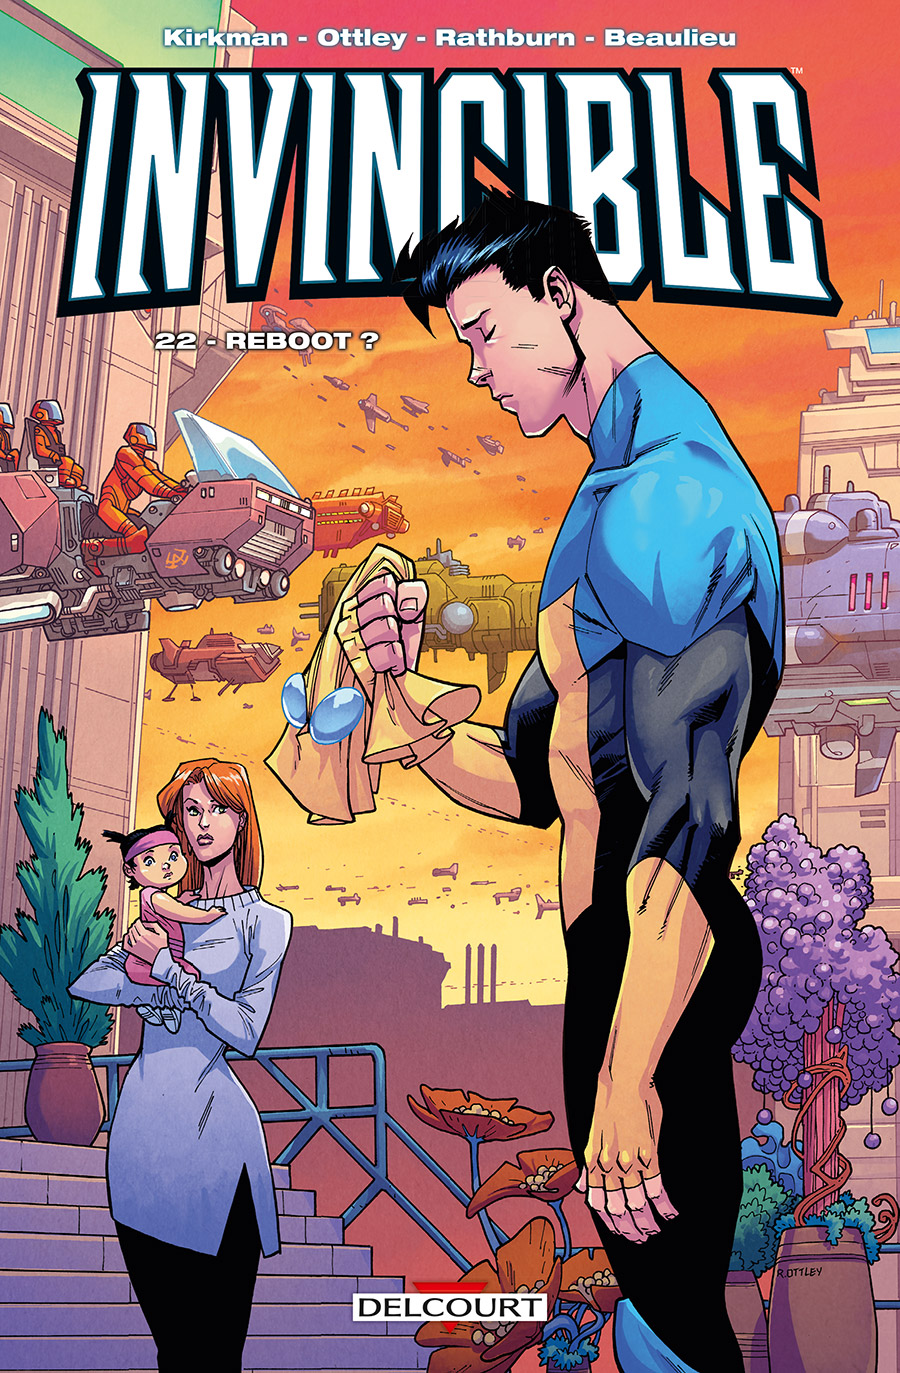 Invincible 22. Reboot ?